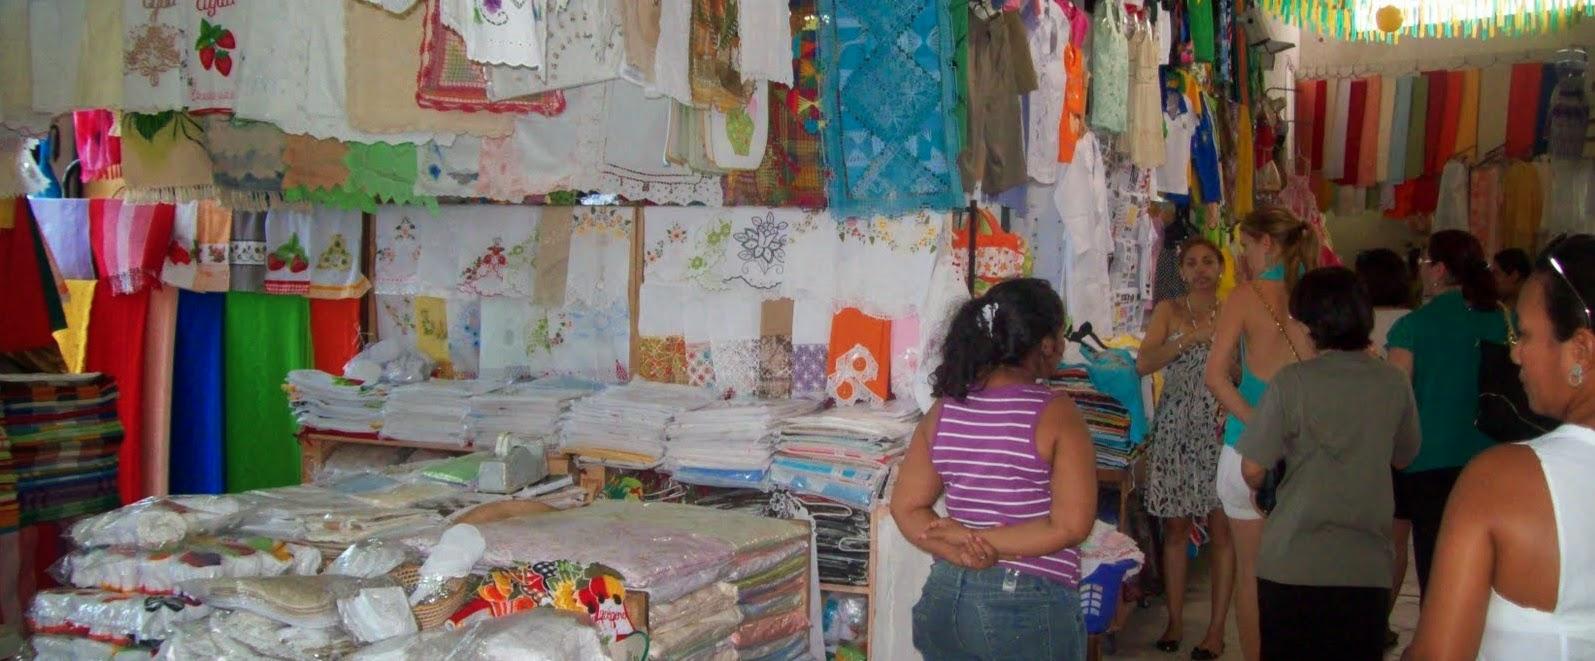 Adesivo De Contato Cascola Fispq ~ Feirinha de artesanato da Beira Mar Fortaleza ~ FELIPE TUR TRASLADOS E PASSEIOS (85) 99719 2659